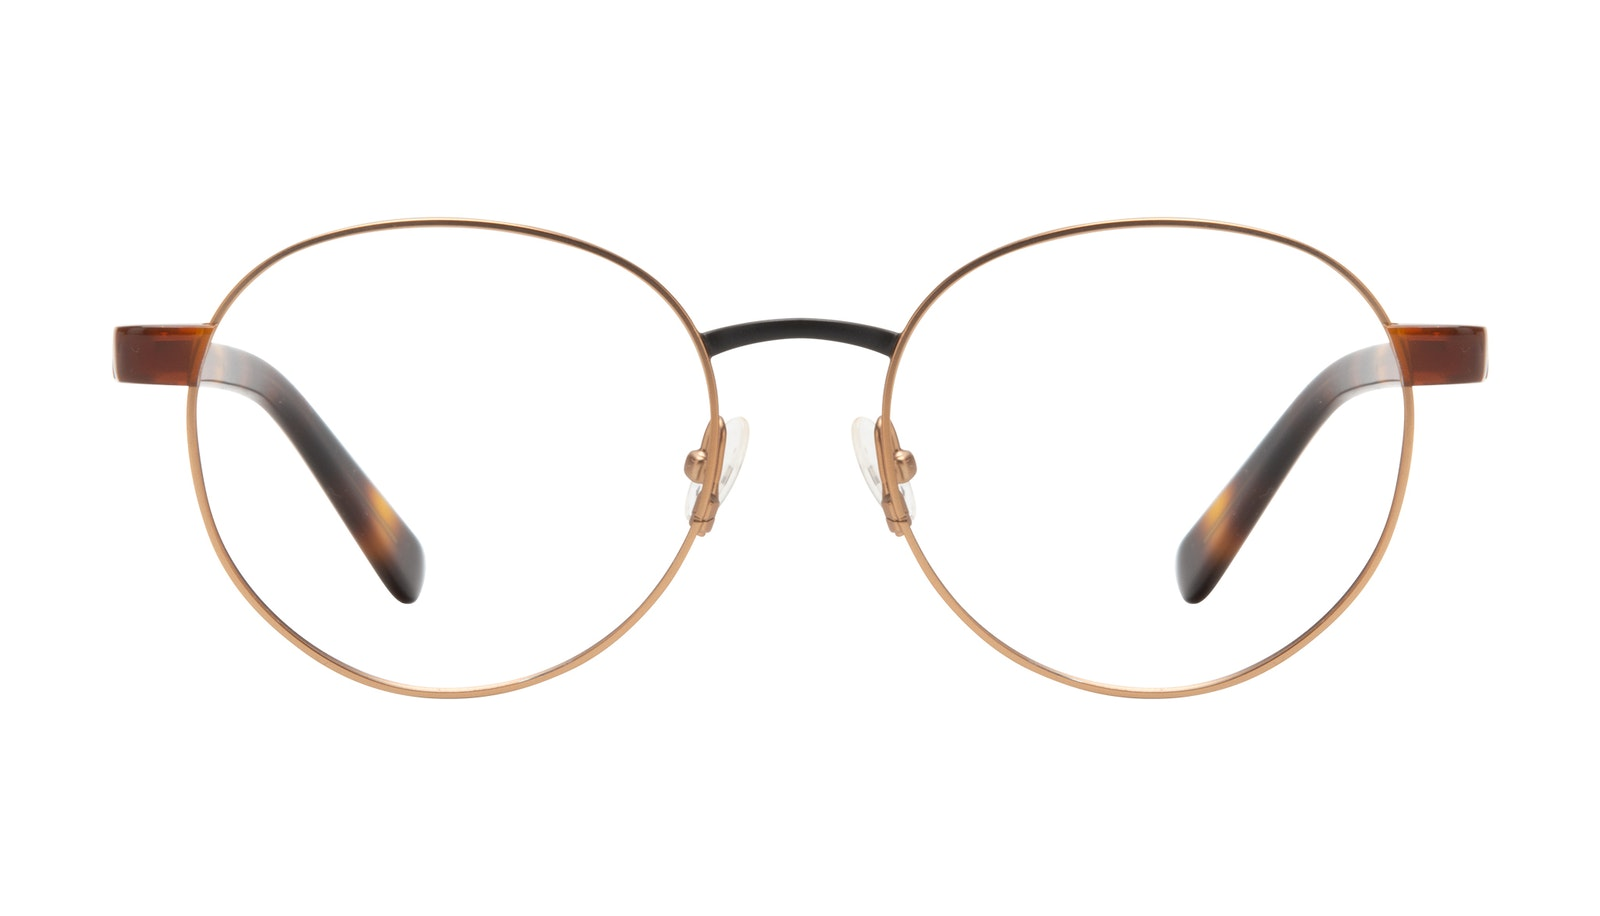 Affordable Fashion Glasses Round Eyeglasses Men Alter Dark Brass